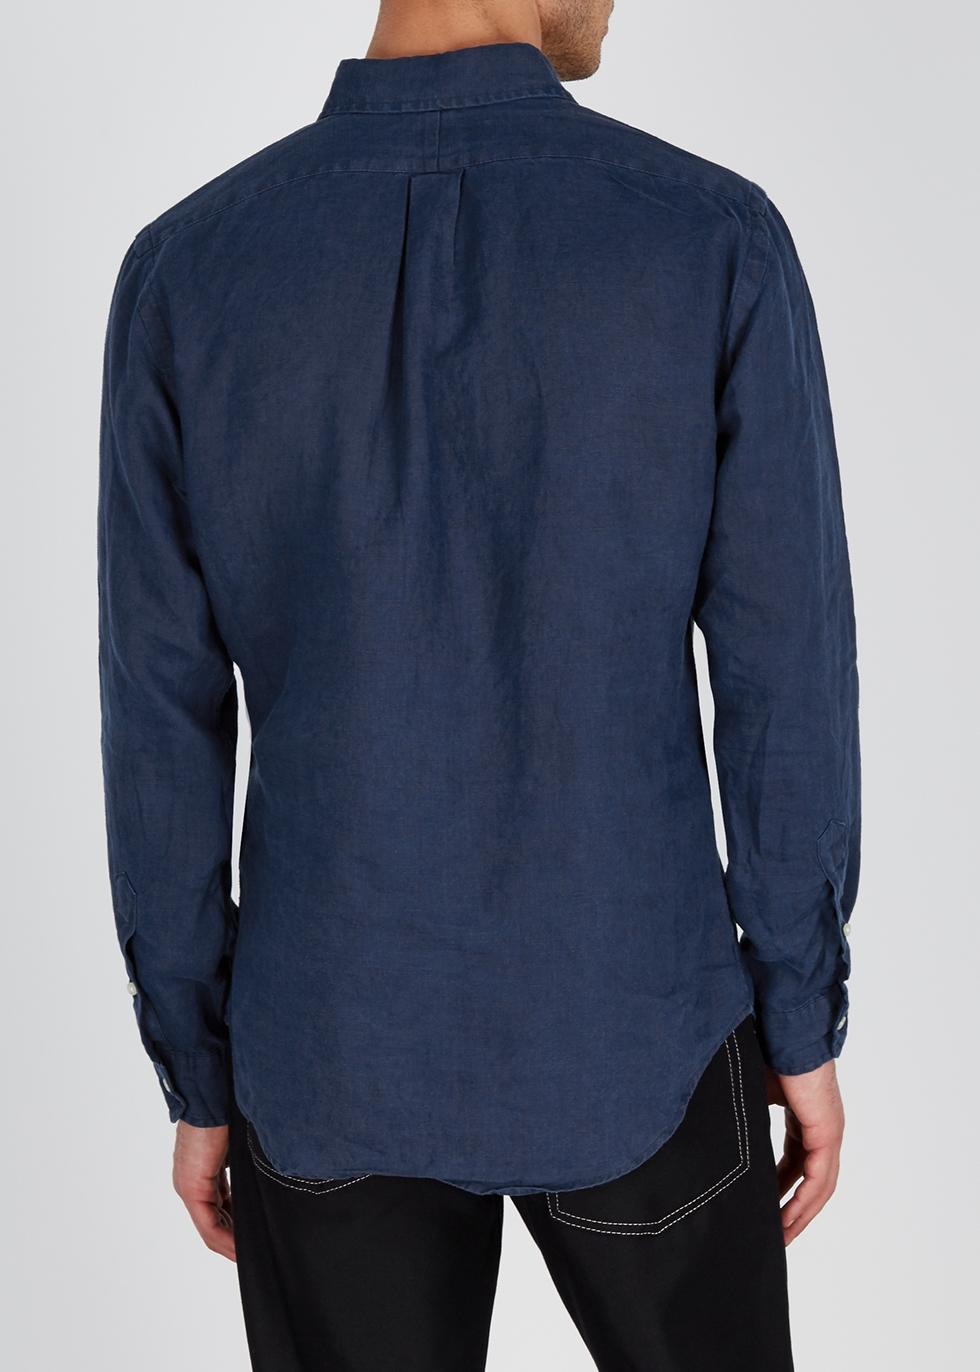 Ralph Harvey Nichols Polo Navy Lauren Linen Shirt Slim nmNwyvO80